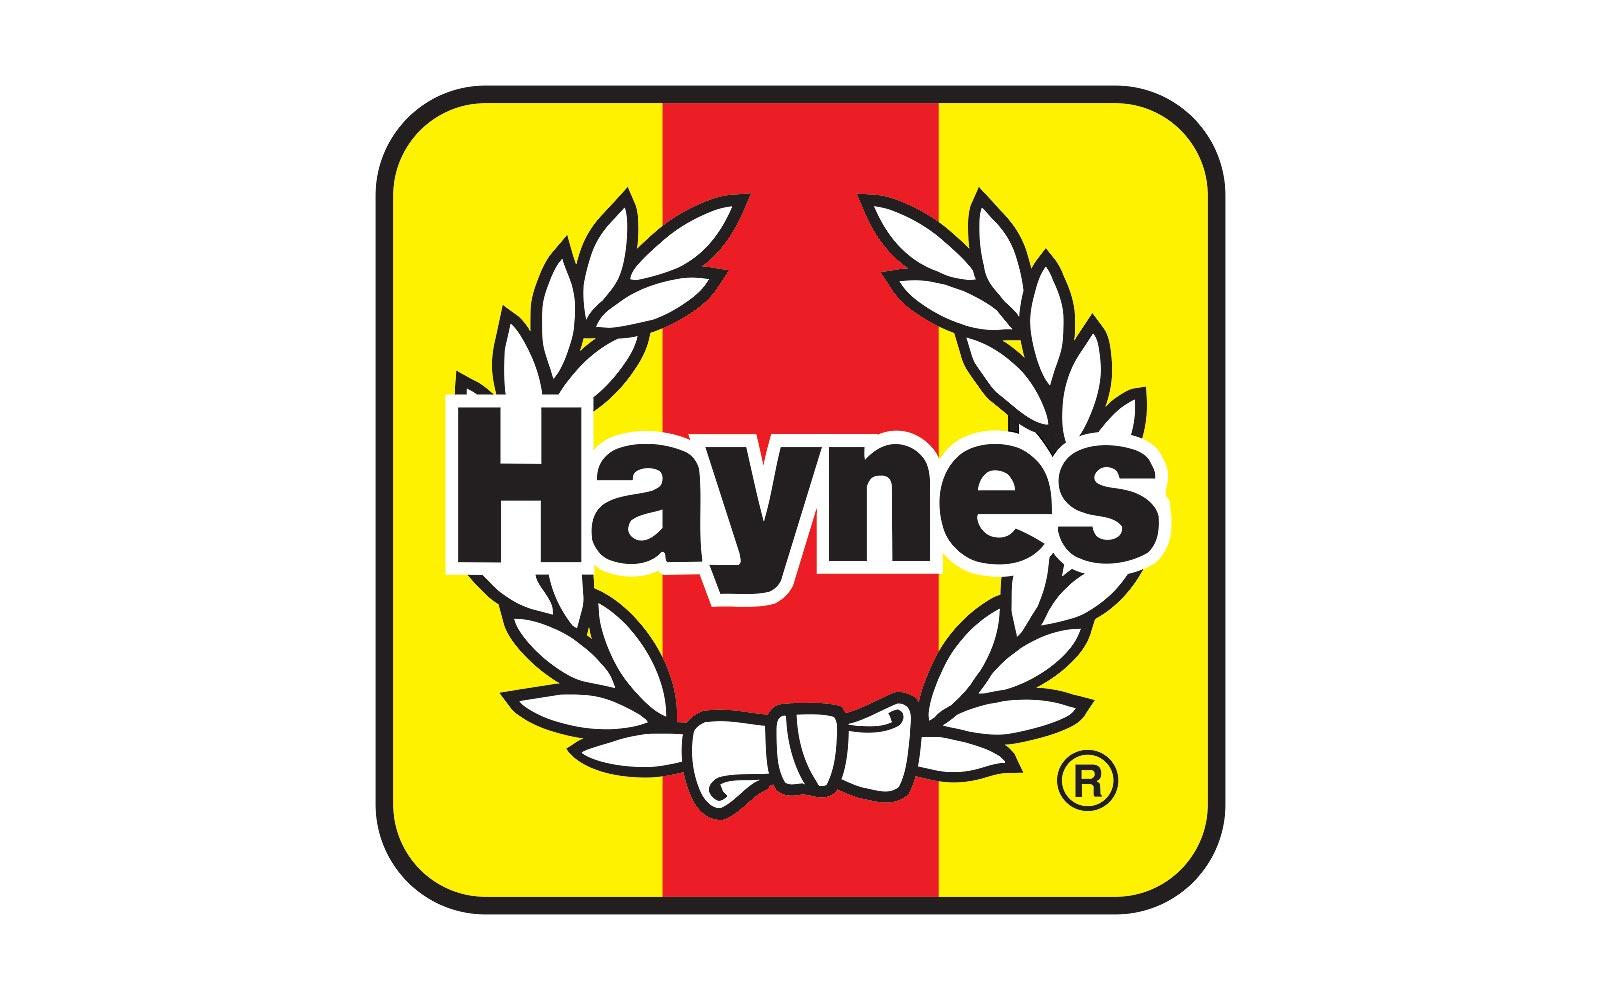 haynes logo